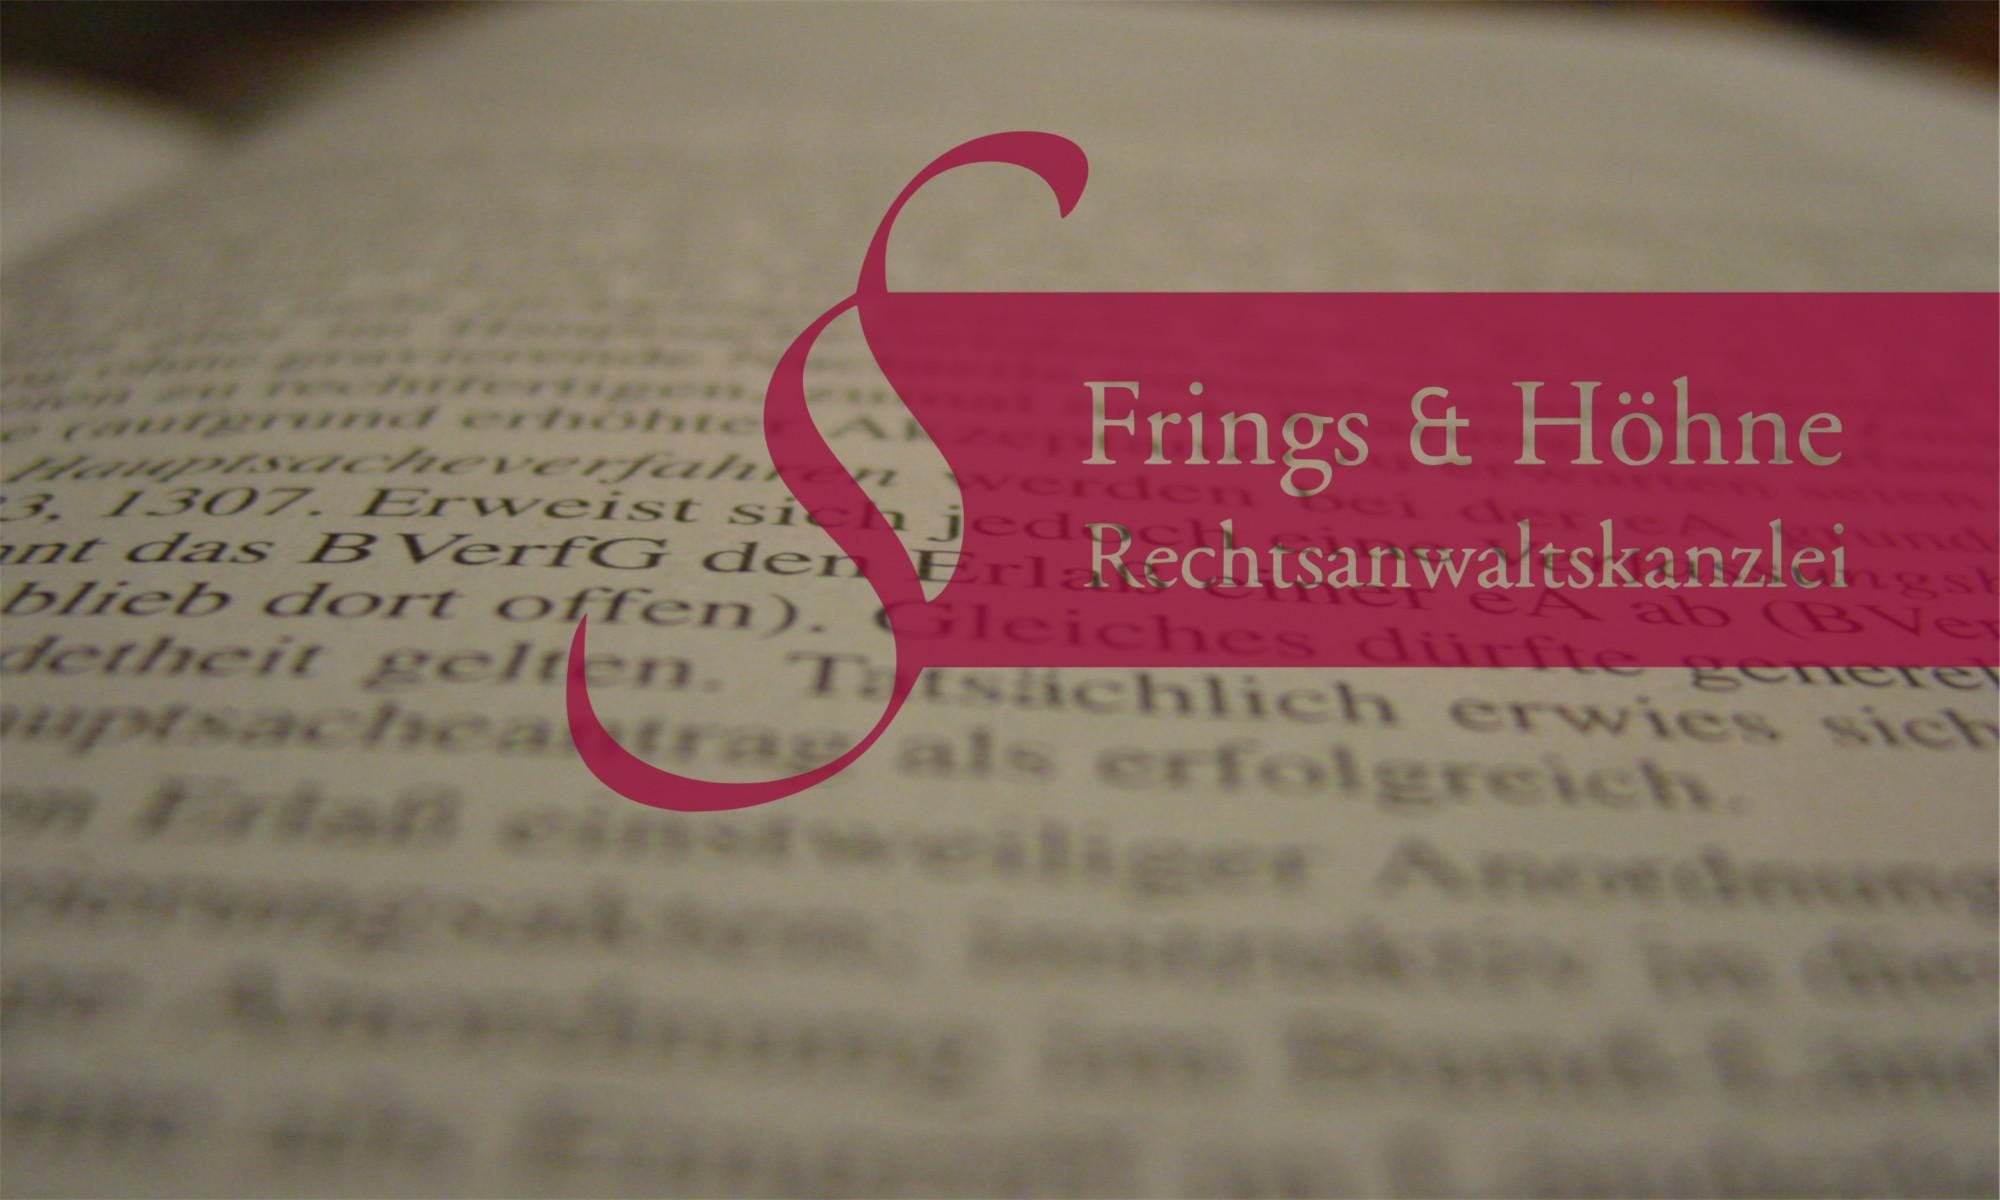 Frings & Höhne